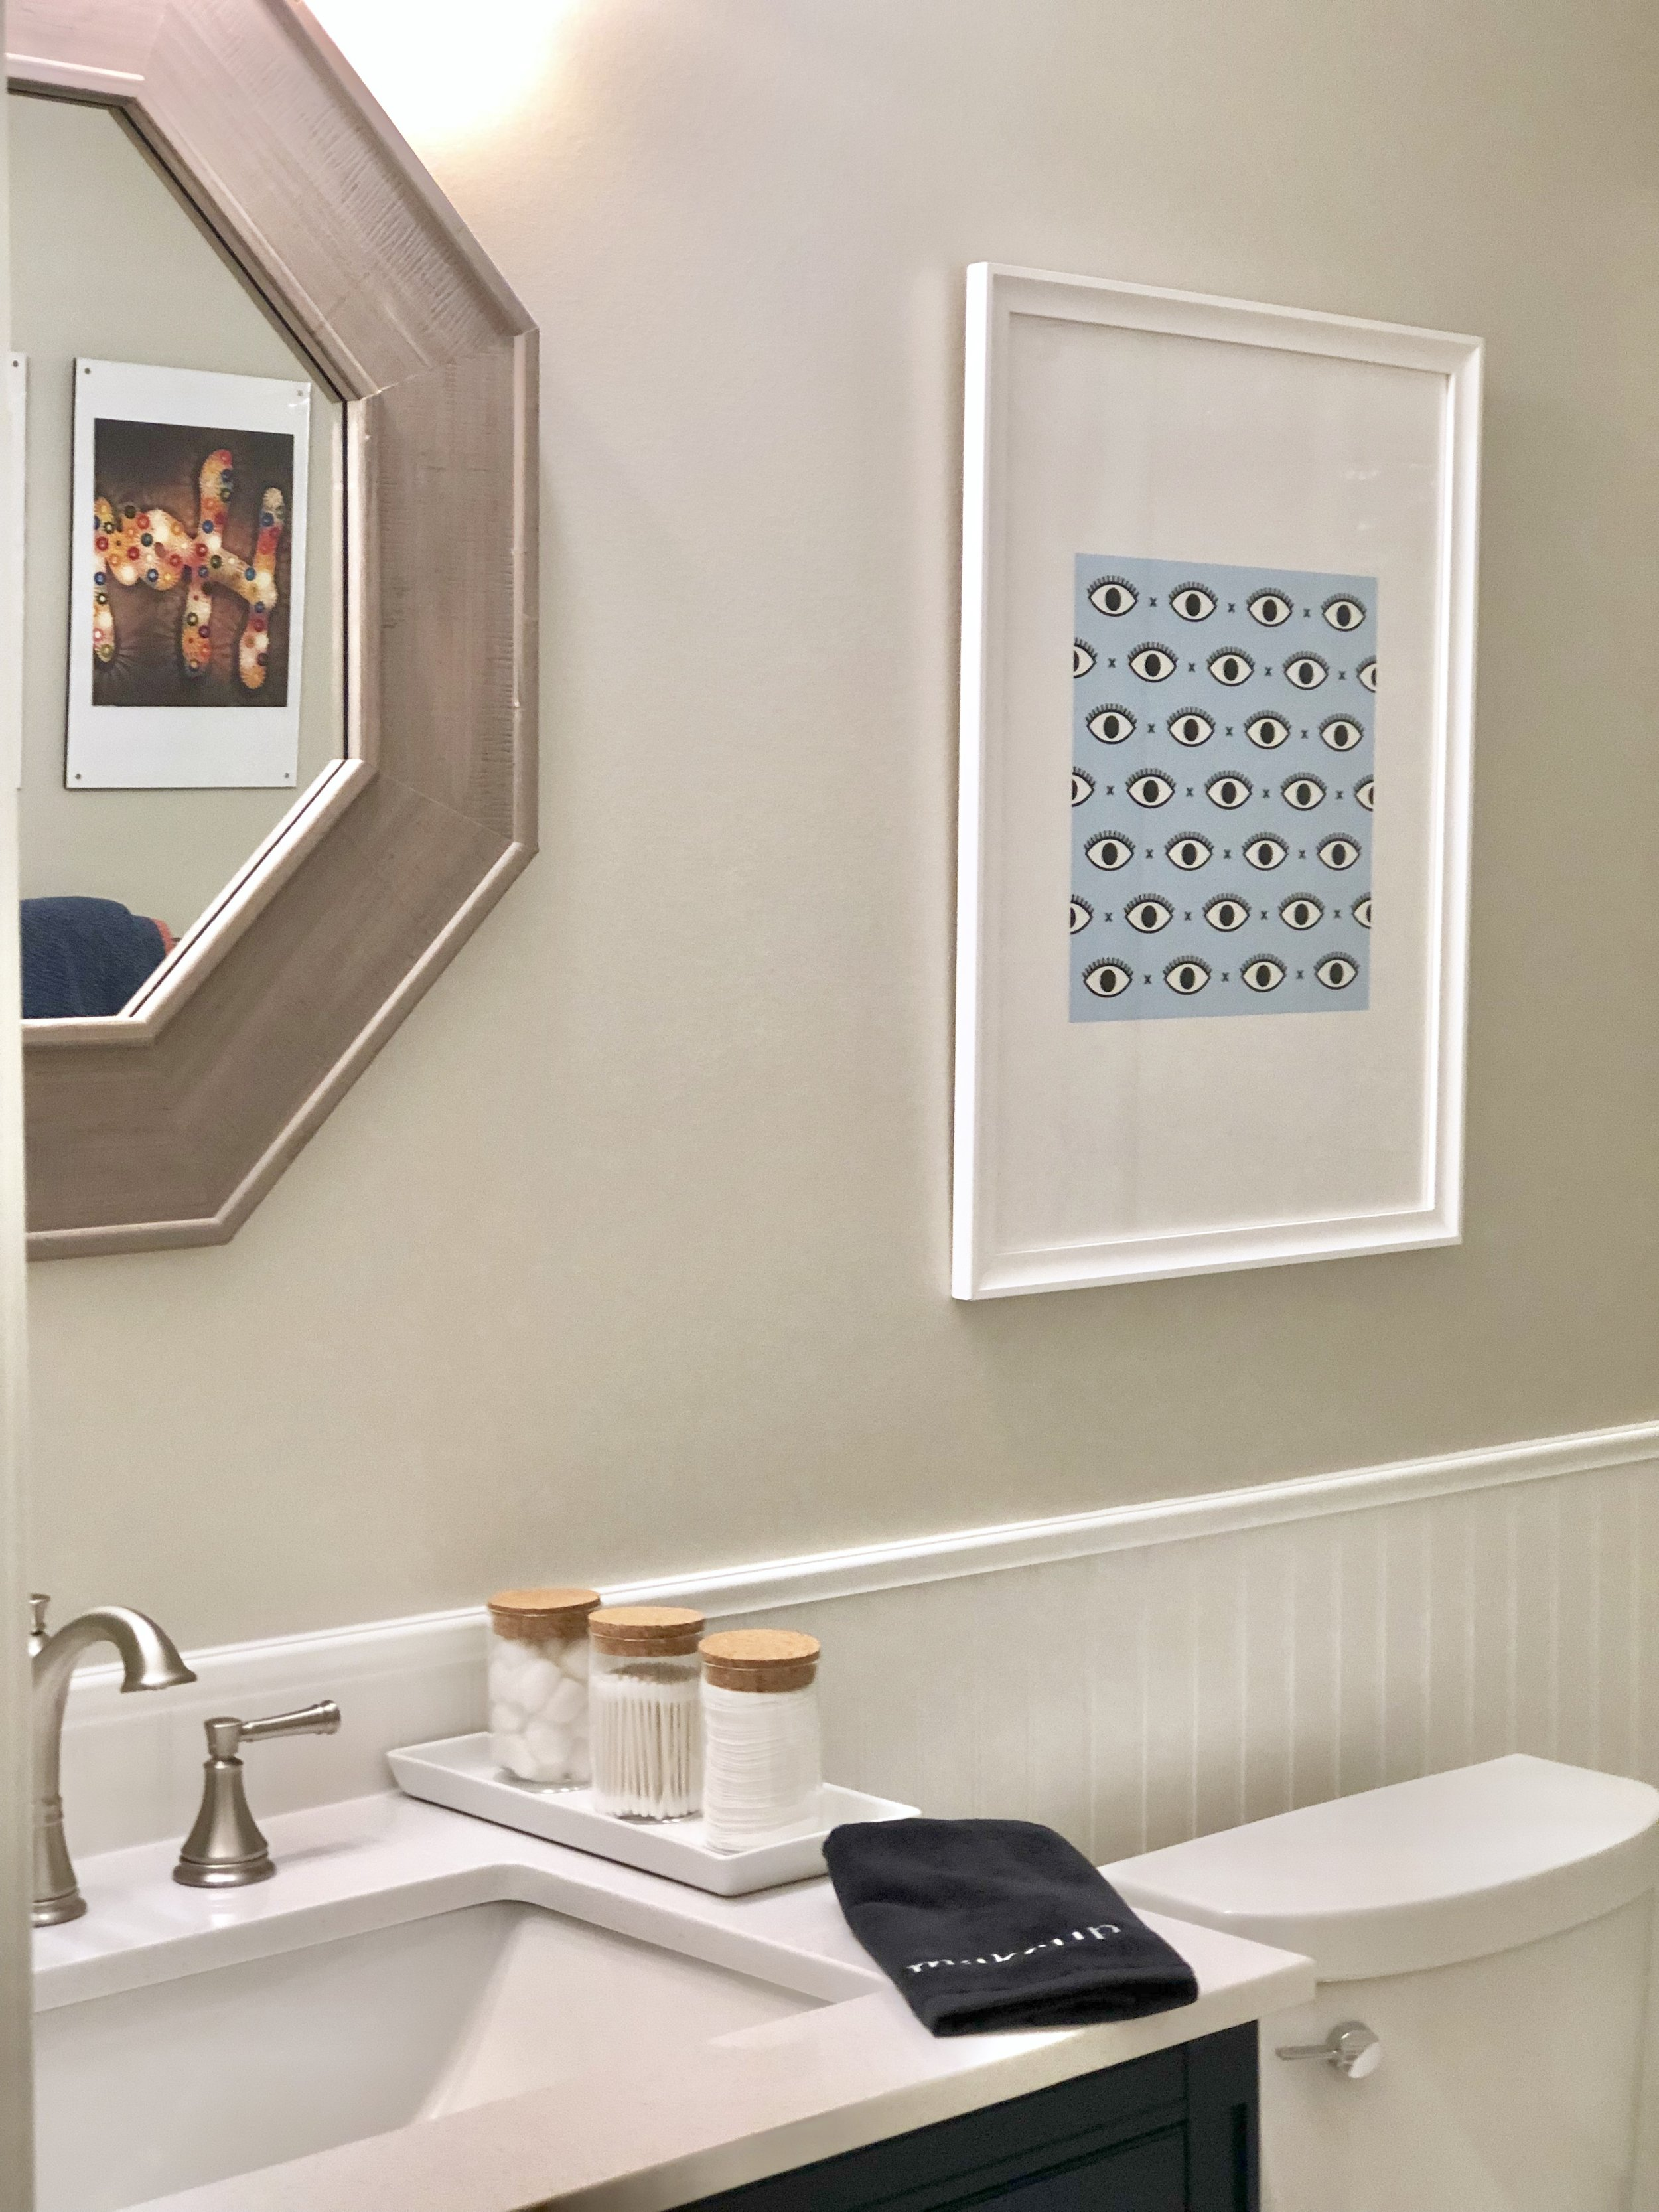 close up bathroom artwork.jpg